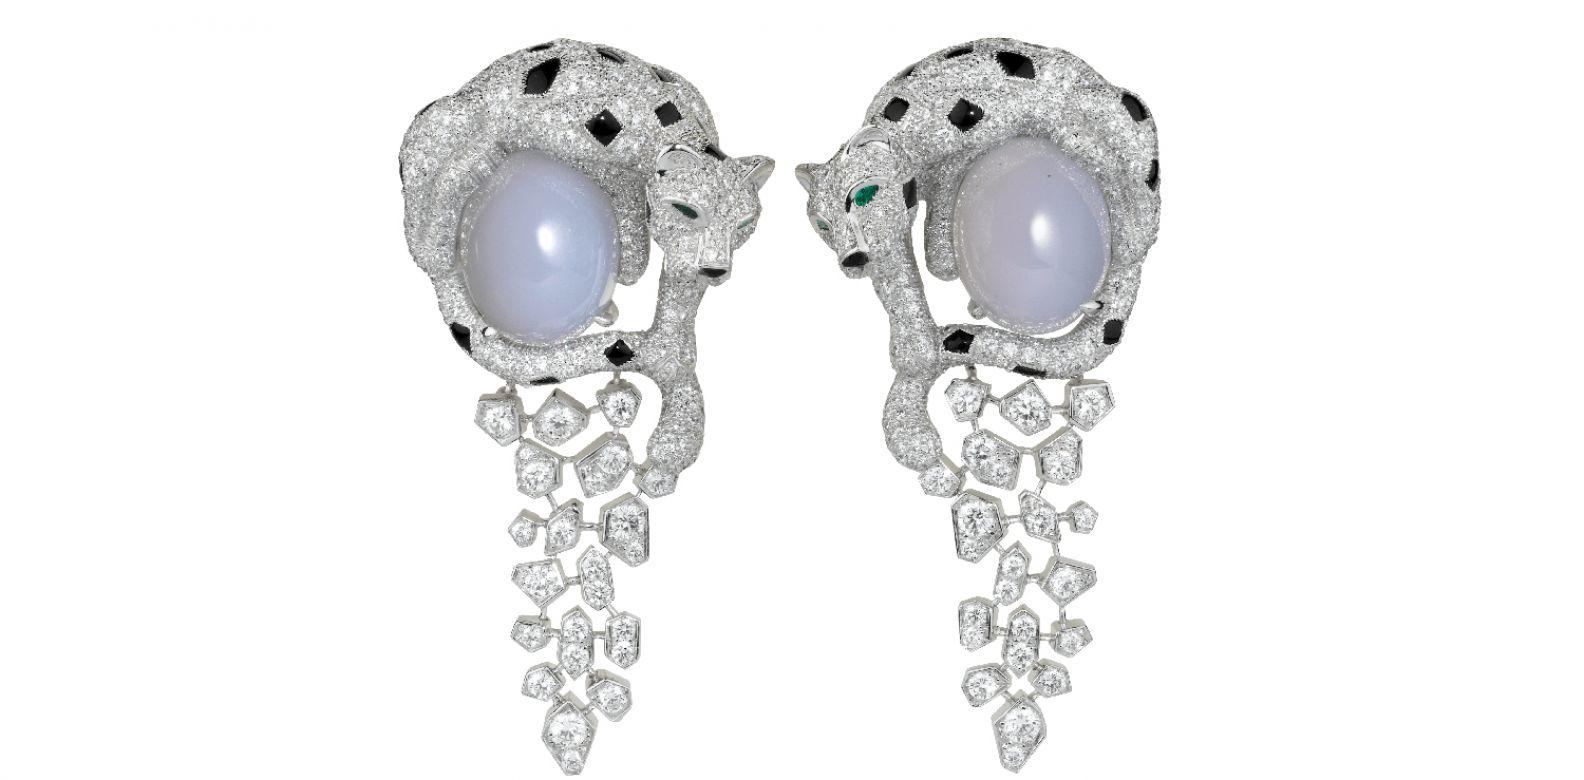 Cartier Royal 美洲豹頂級珠寶系列藍玉髓耳環。(圖片提供/Cartier)